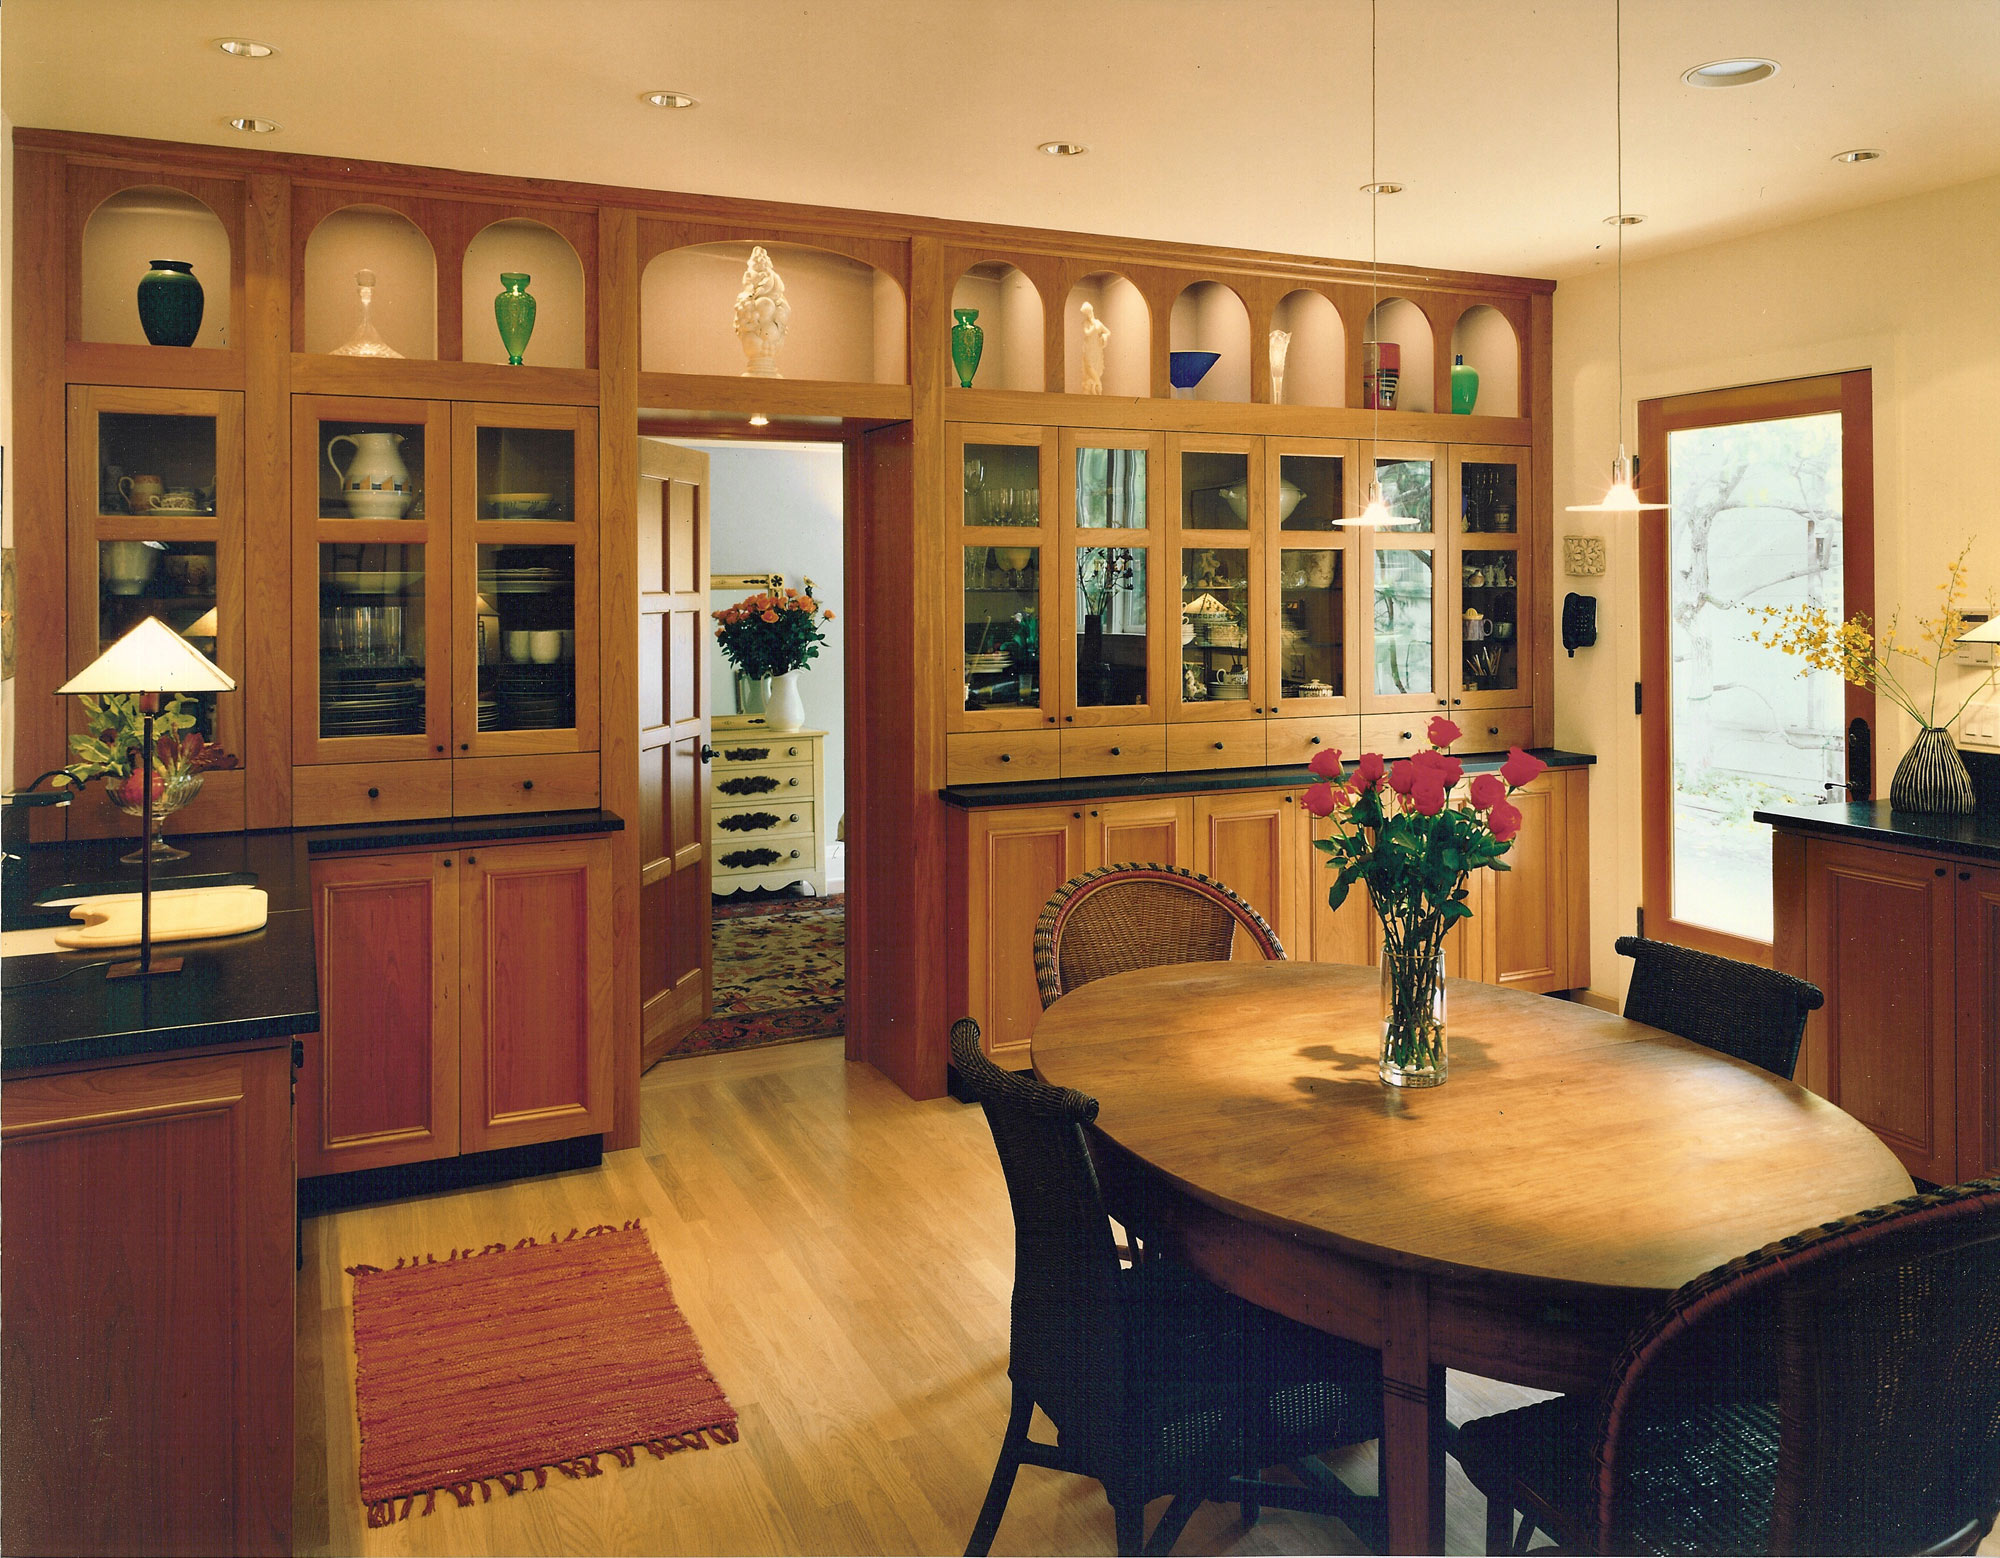 Kaplan-Architects-Berkeley-kitchen-remodel-1.jpg